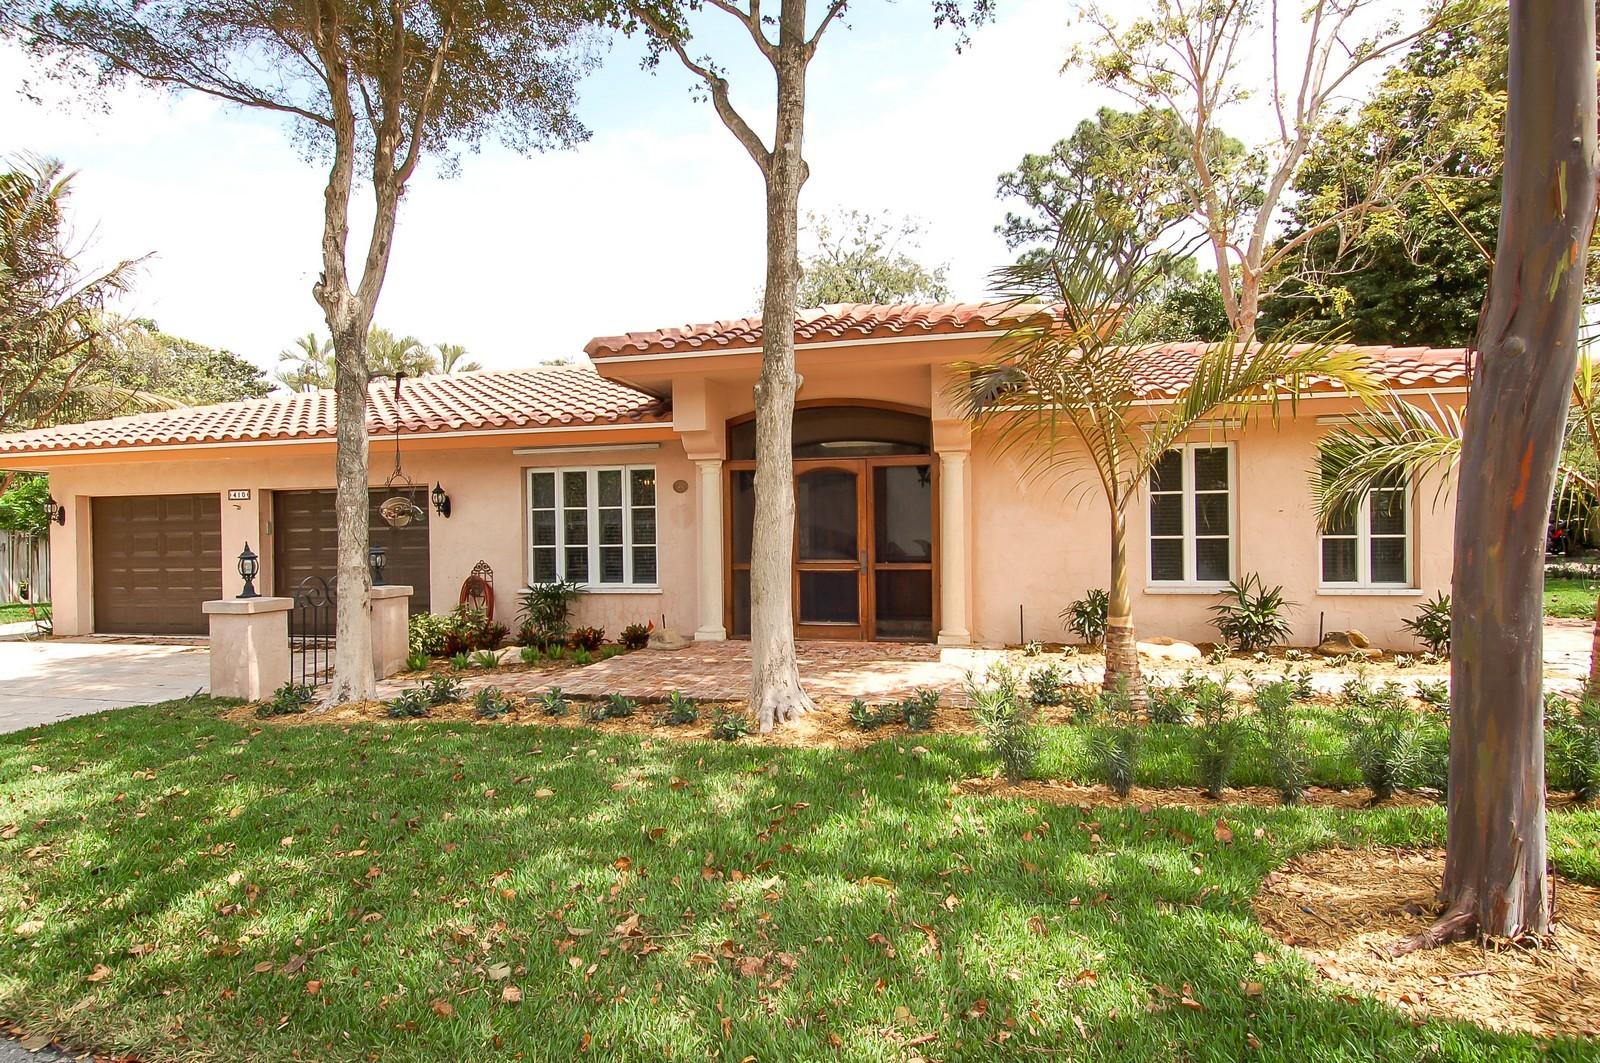 Real Estate Photography - 899 Azalea St, Boca Raton, FL, 33486 - Front View